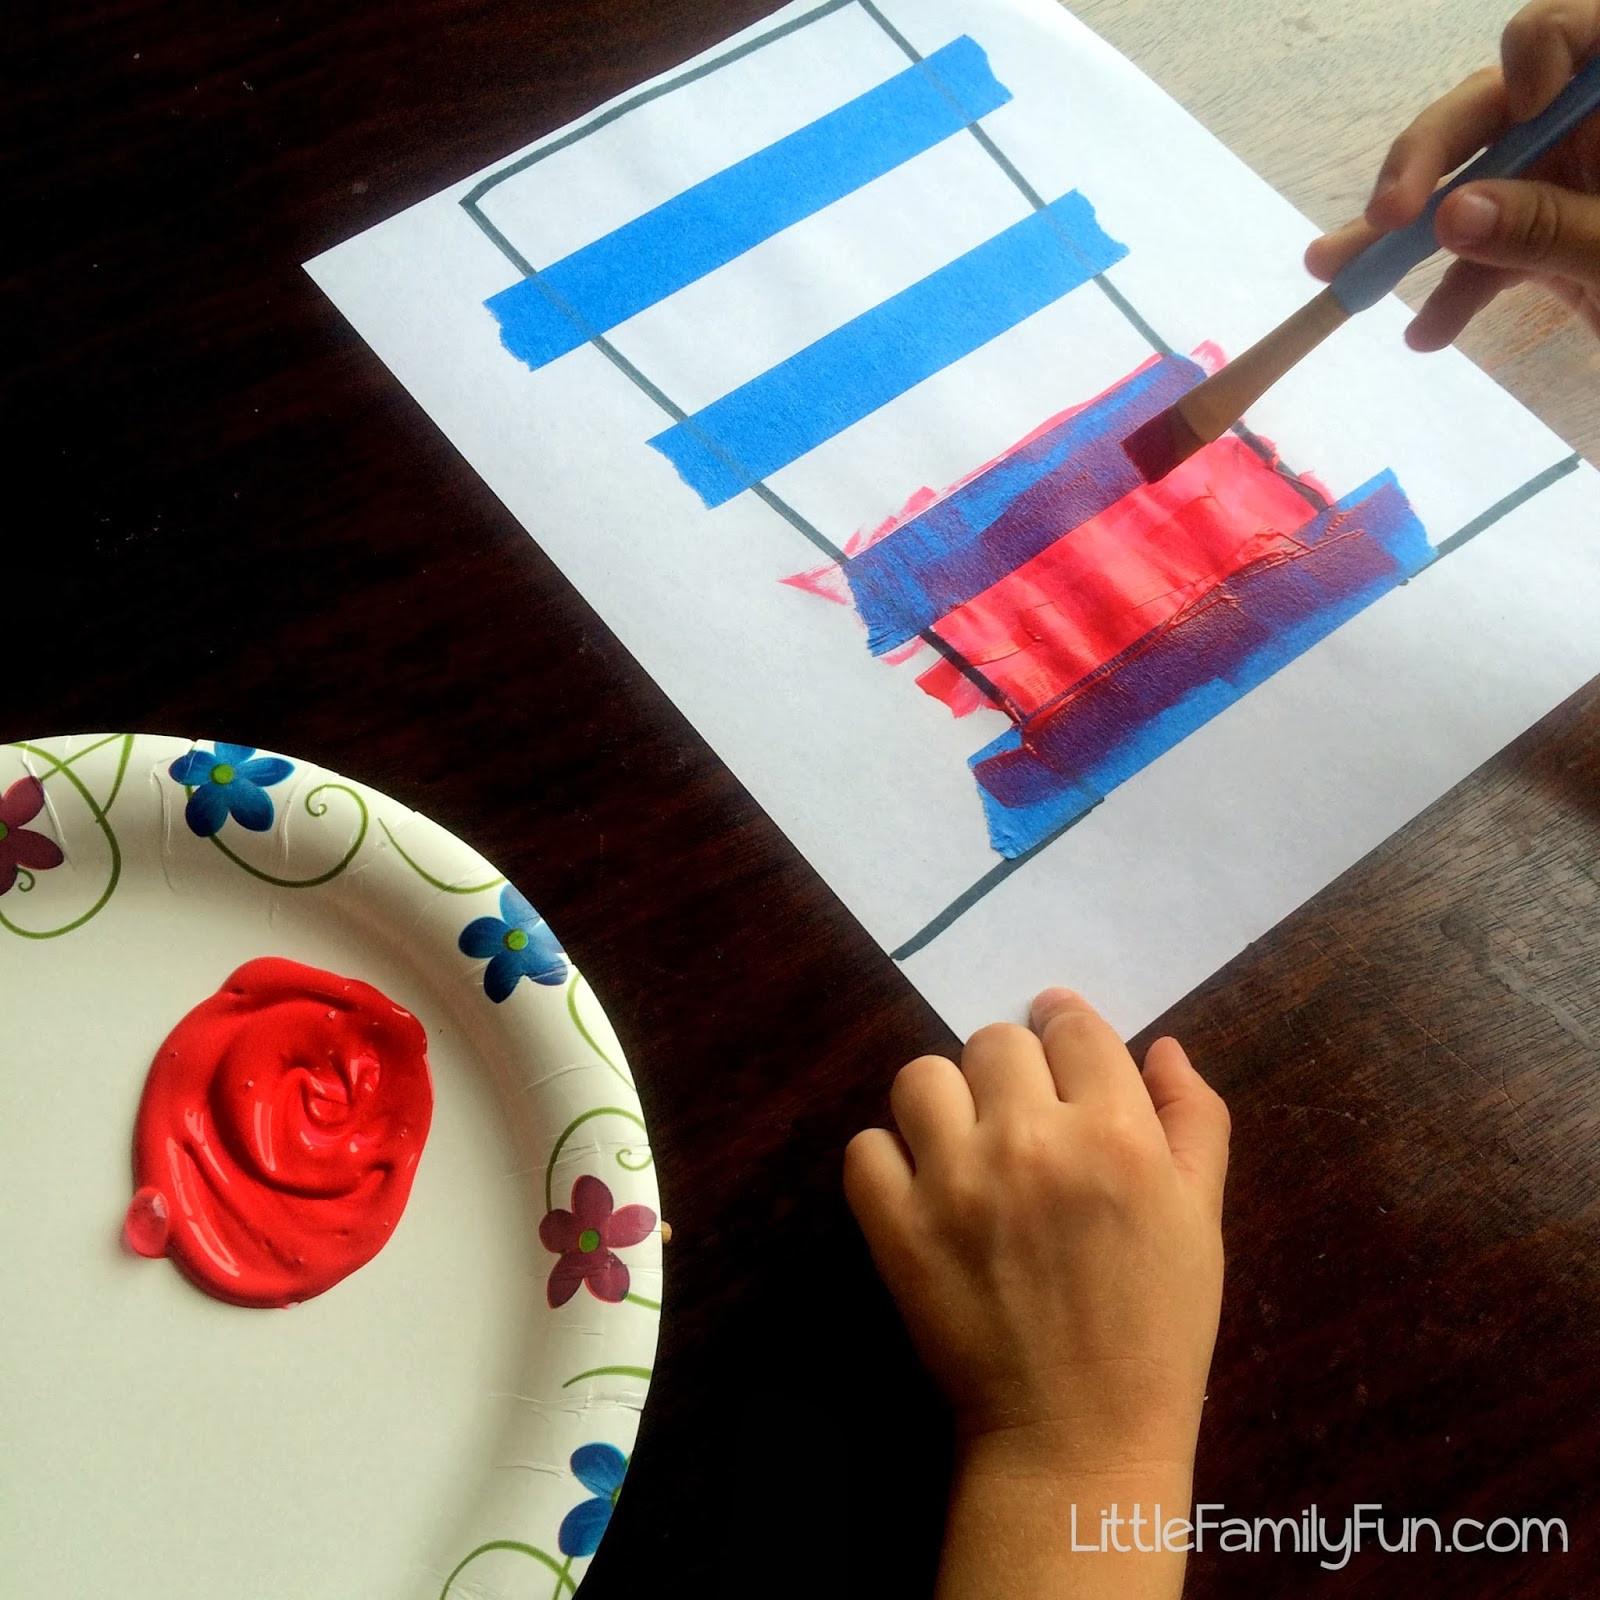 Dr Seuss Craft Ideas For Preschoolers  Easy Dr Seuss Craft